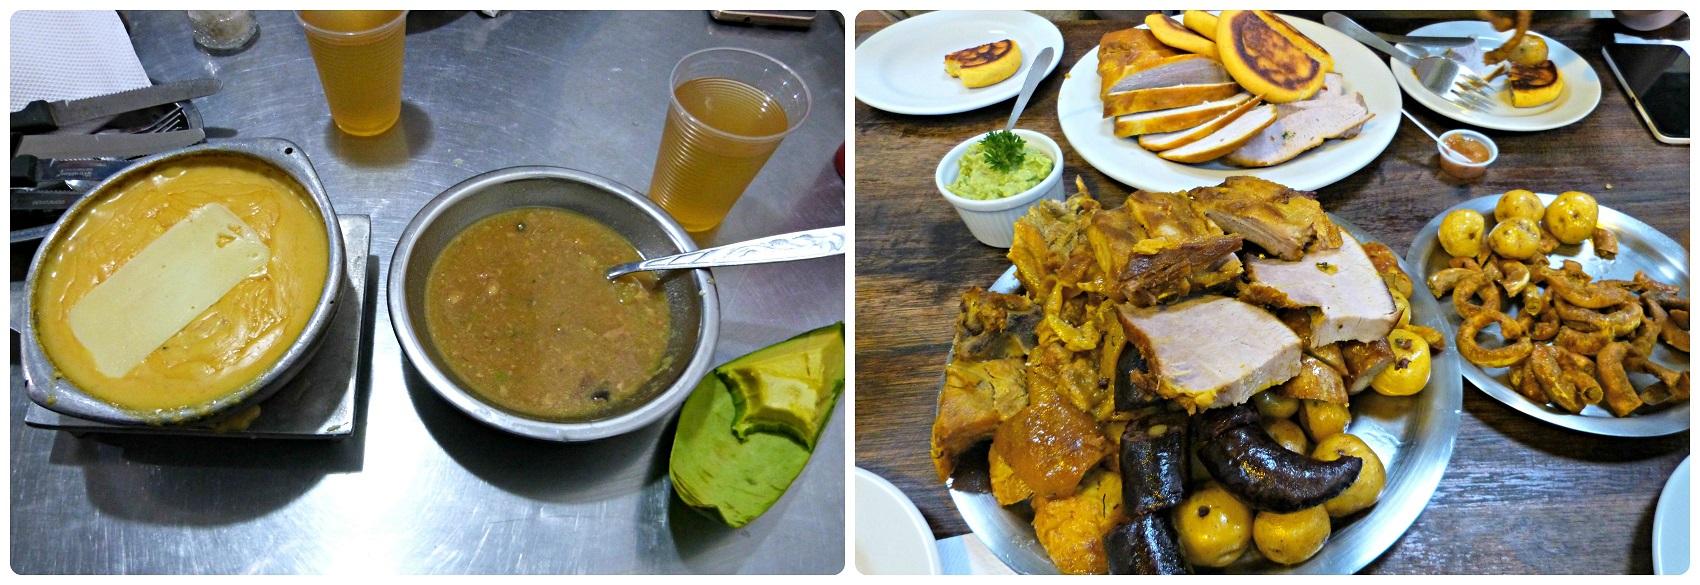 Plats que nous avons commandés dans un restaurant de fruits de mer de Bogotá et un restaurant de picada